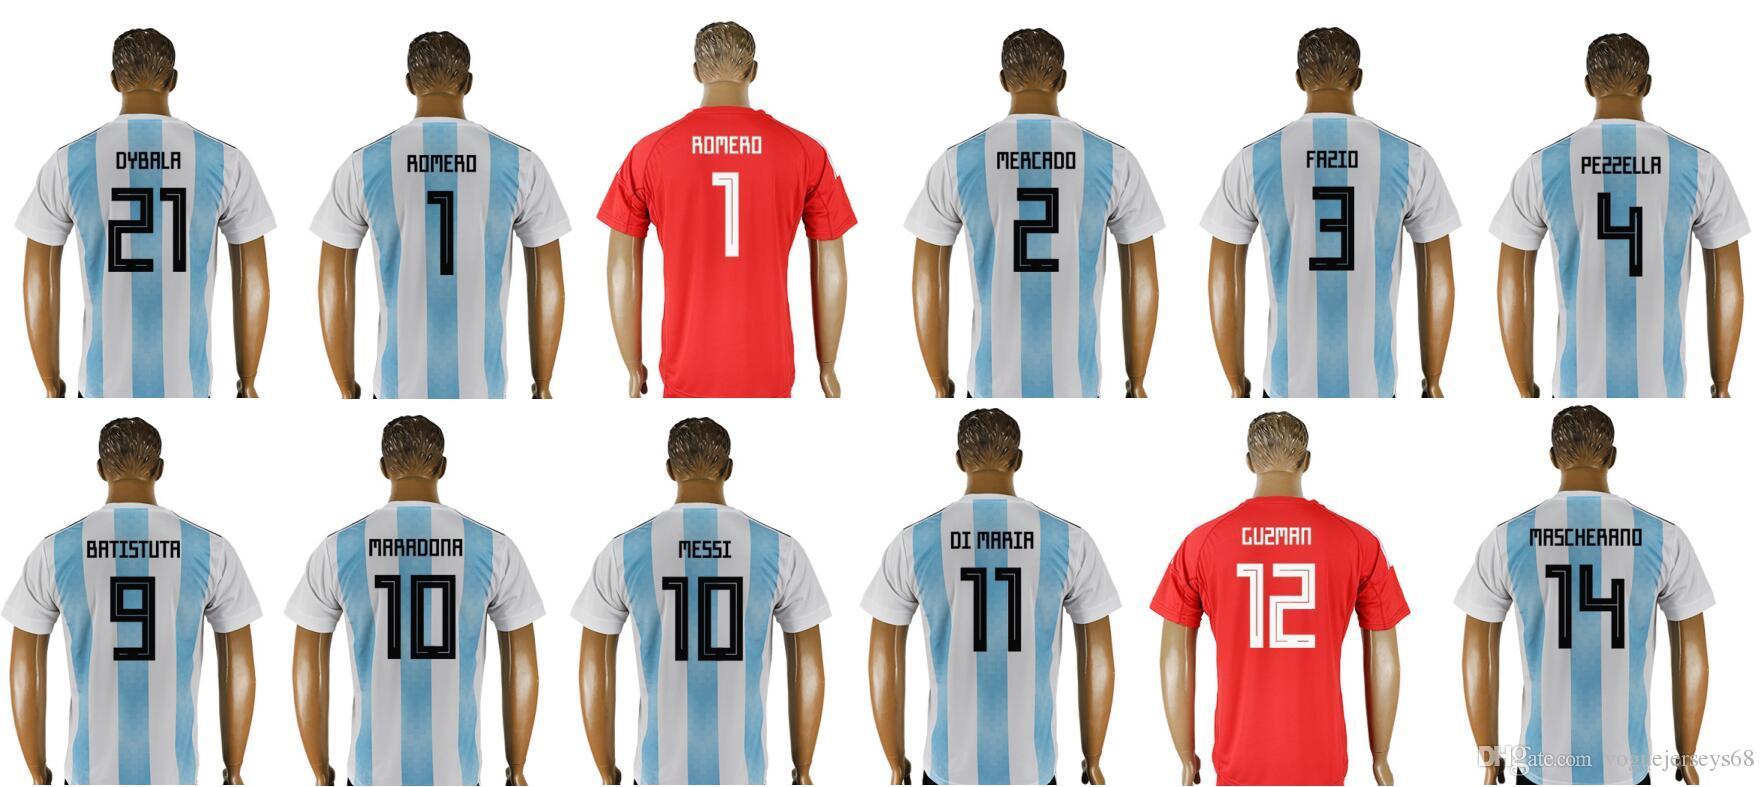 online store 55ac7 fad18 Mens New 2018 Argentina Team #1 Sergio Romero Diego Maradona 9 Gabriel  Batistuta 10 Lionel Messi Uniforms Shirts Sports Soccer Jerseys Cheap